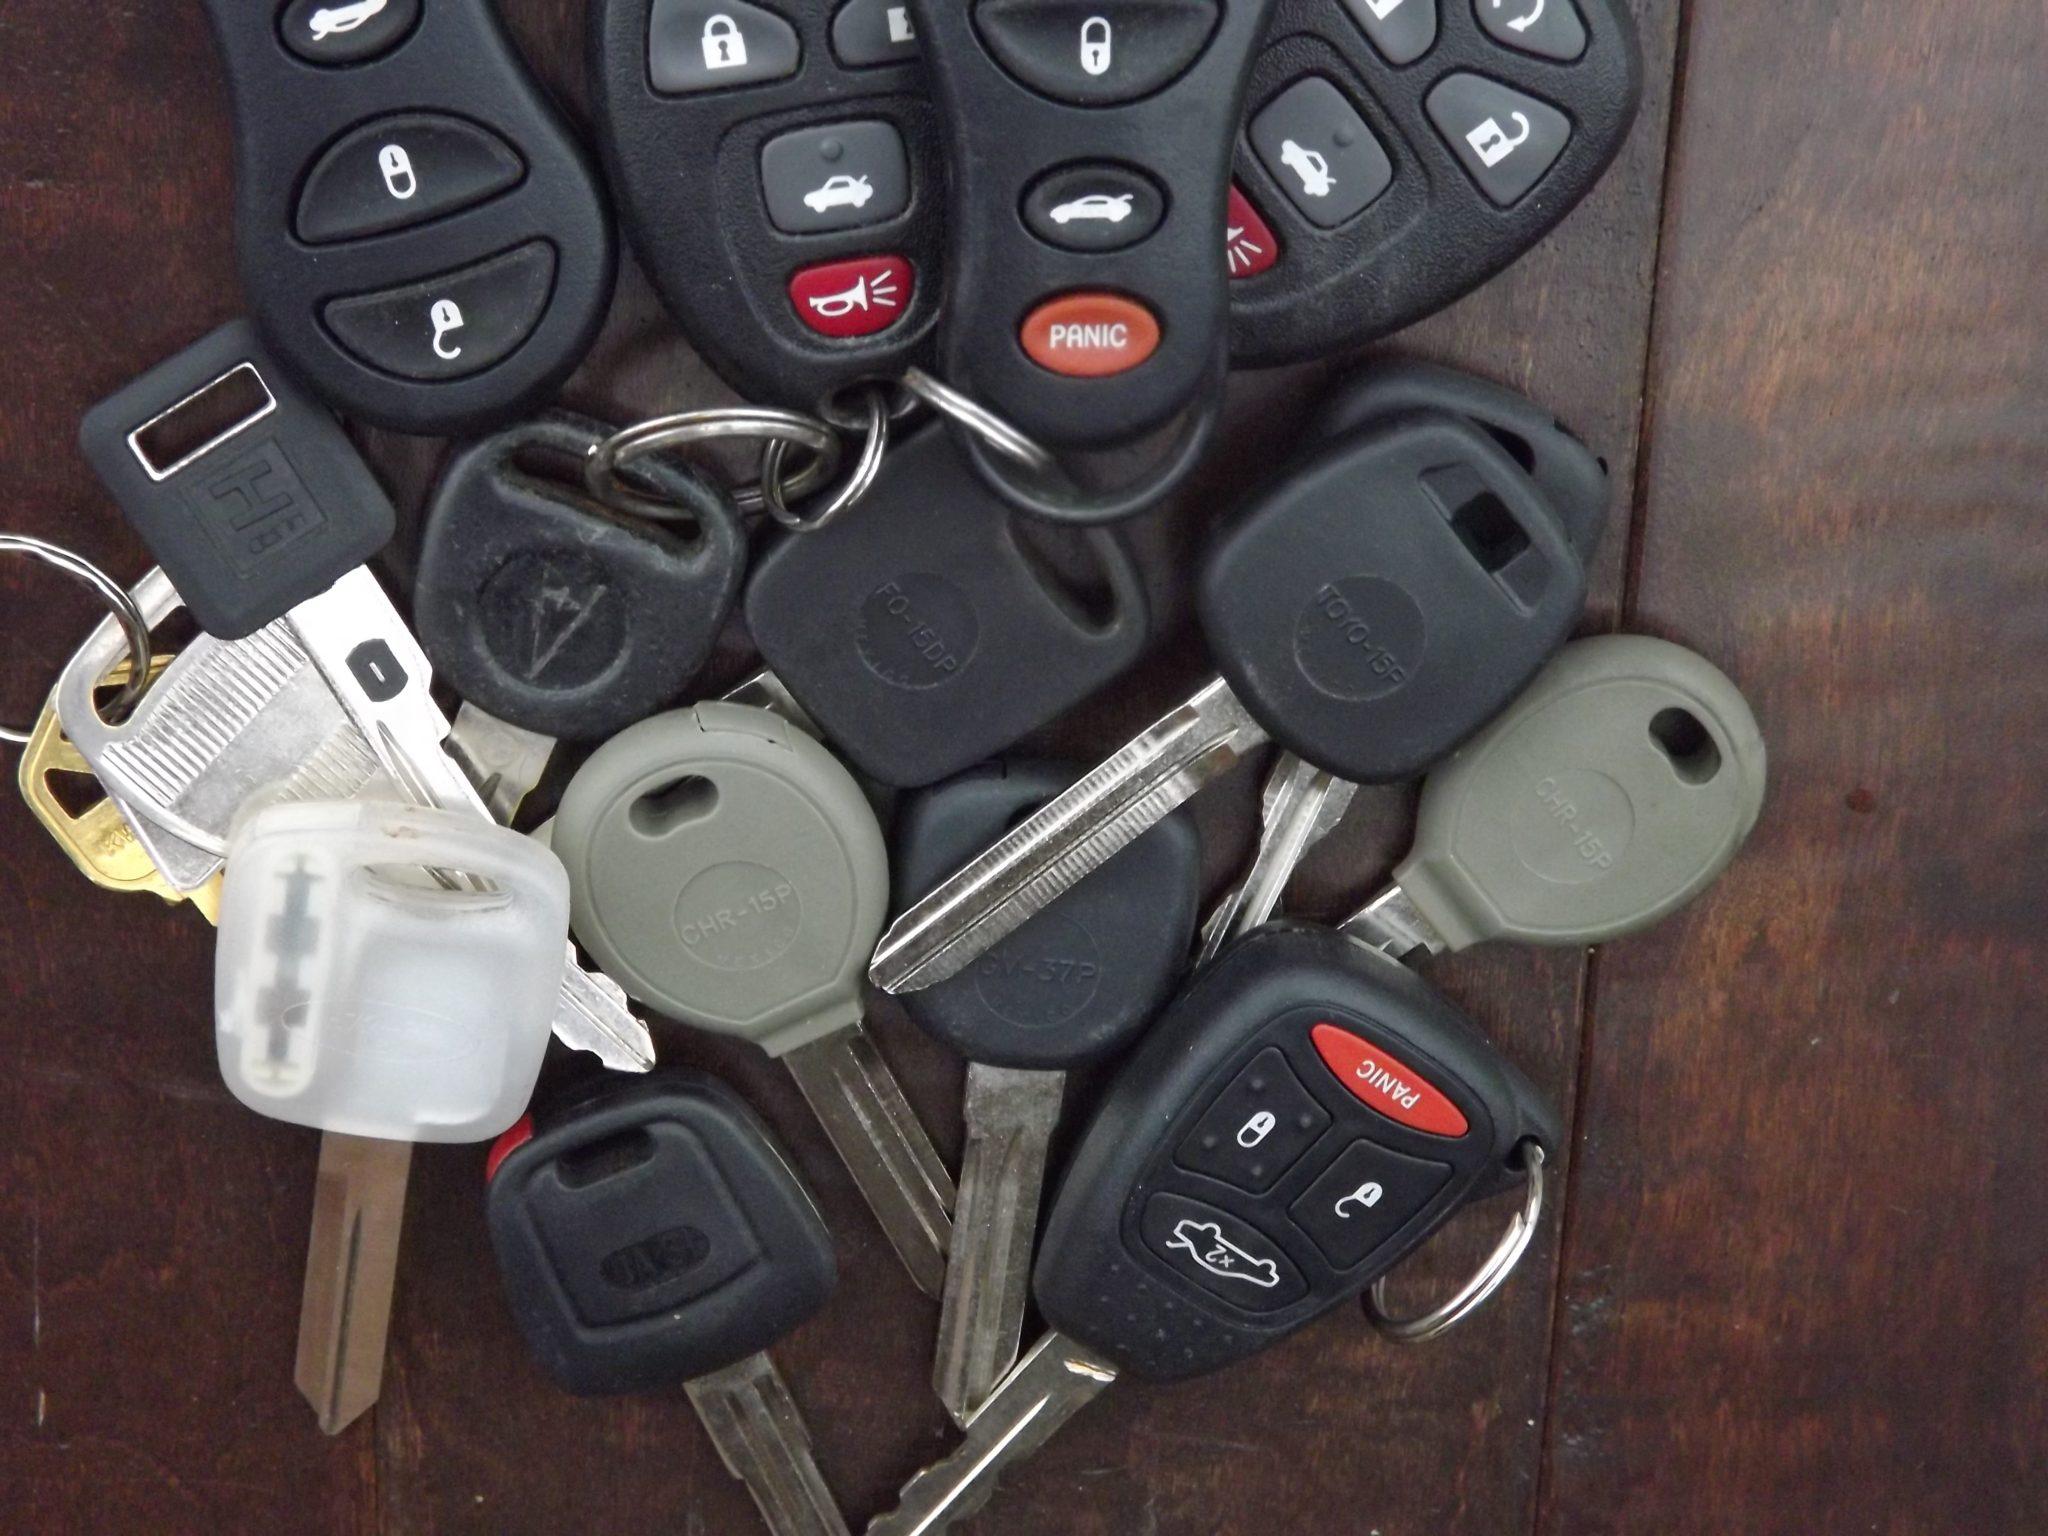 Keys locked in car automotive locksmith in phoenix arizona - Car Keys Computer Chip Vehicle Keys Car Remotes Transponder Keys